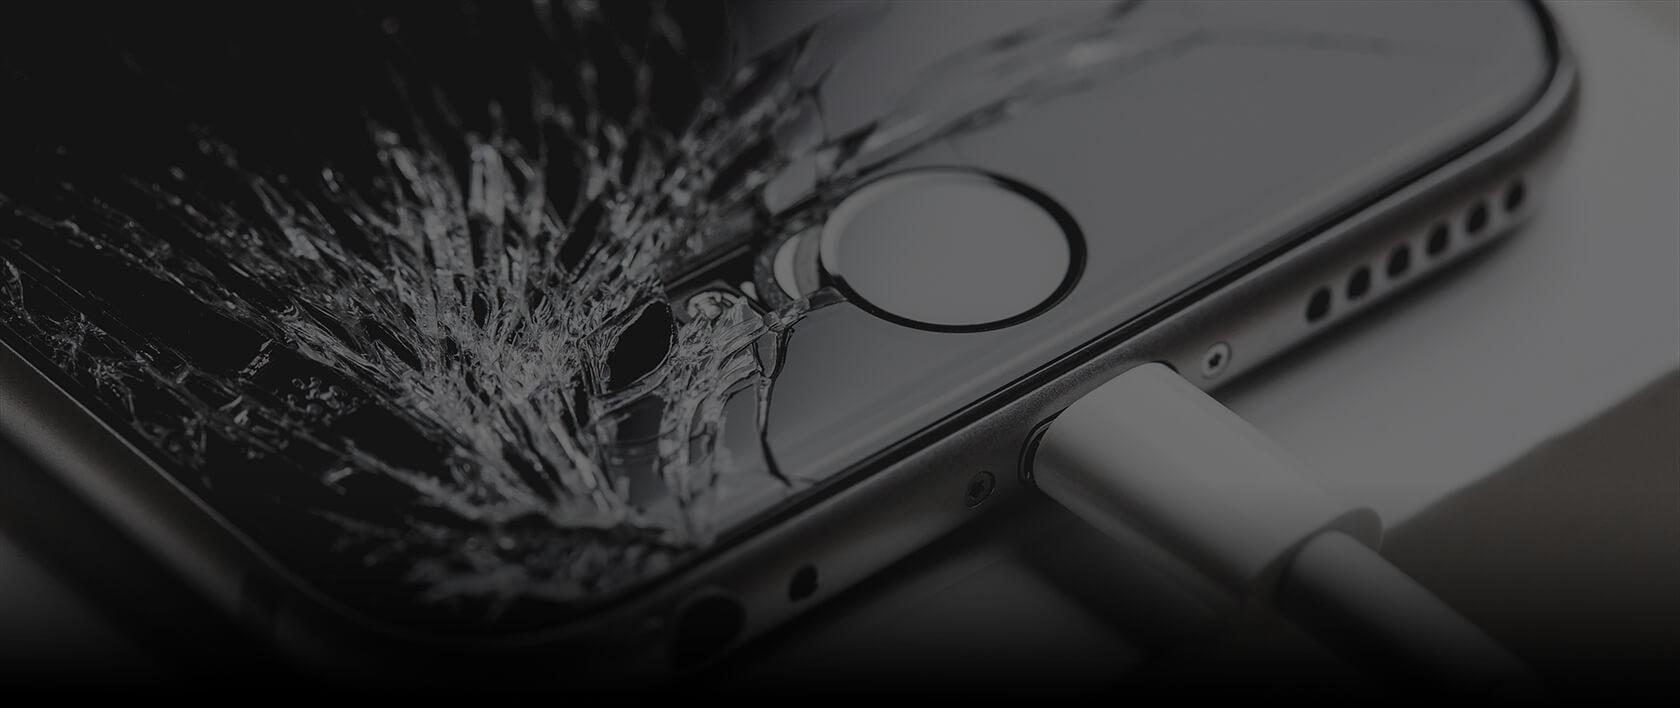 iphonefix richardson (@iphonefixrichardson1) Cover Image